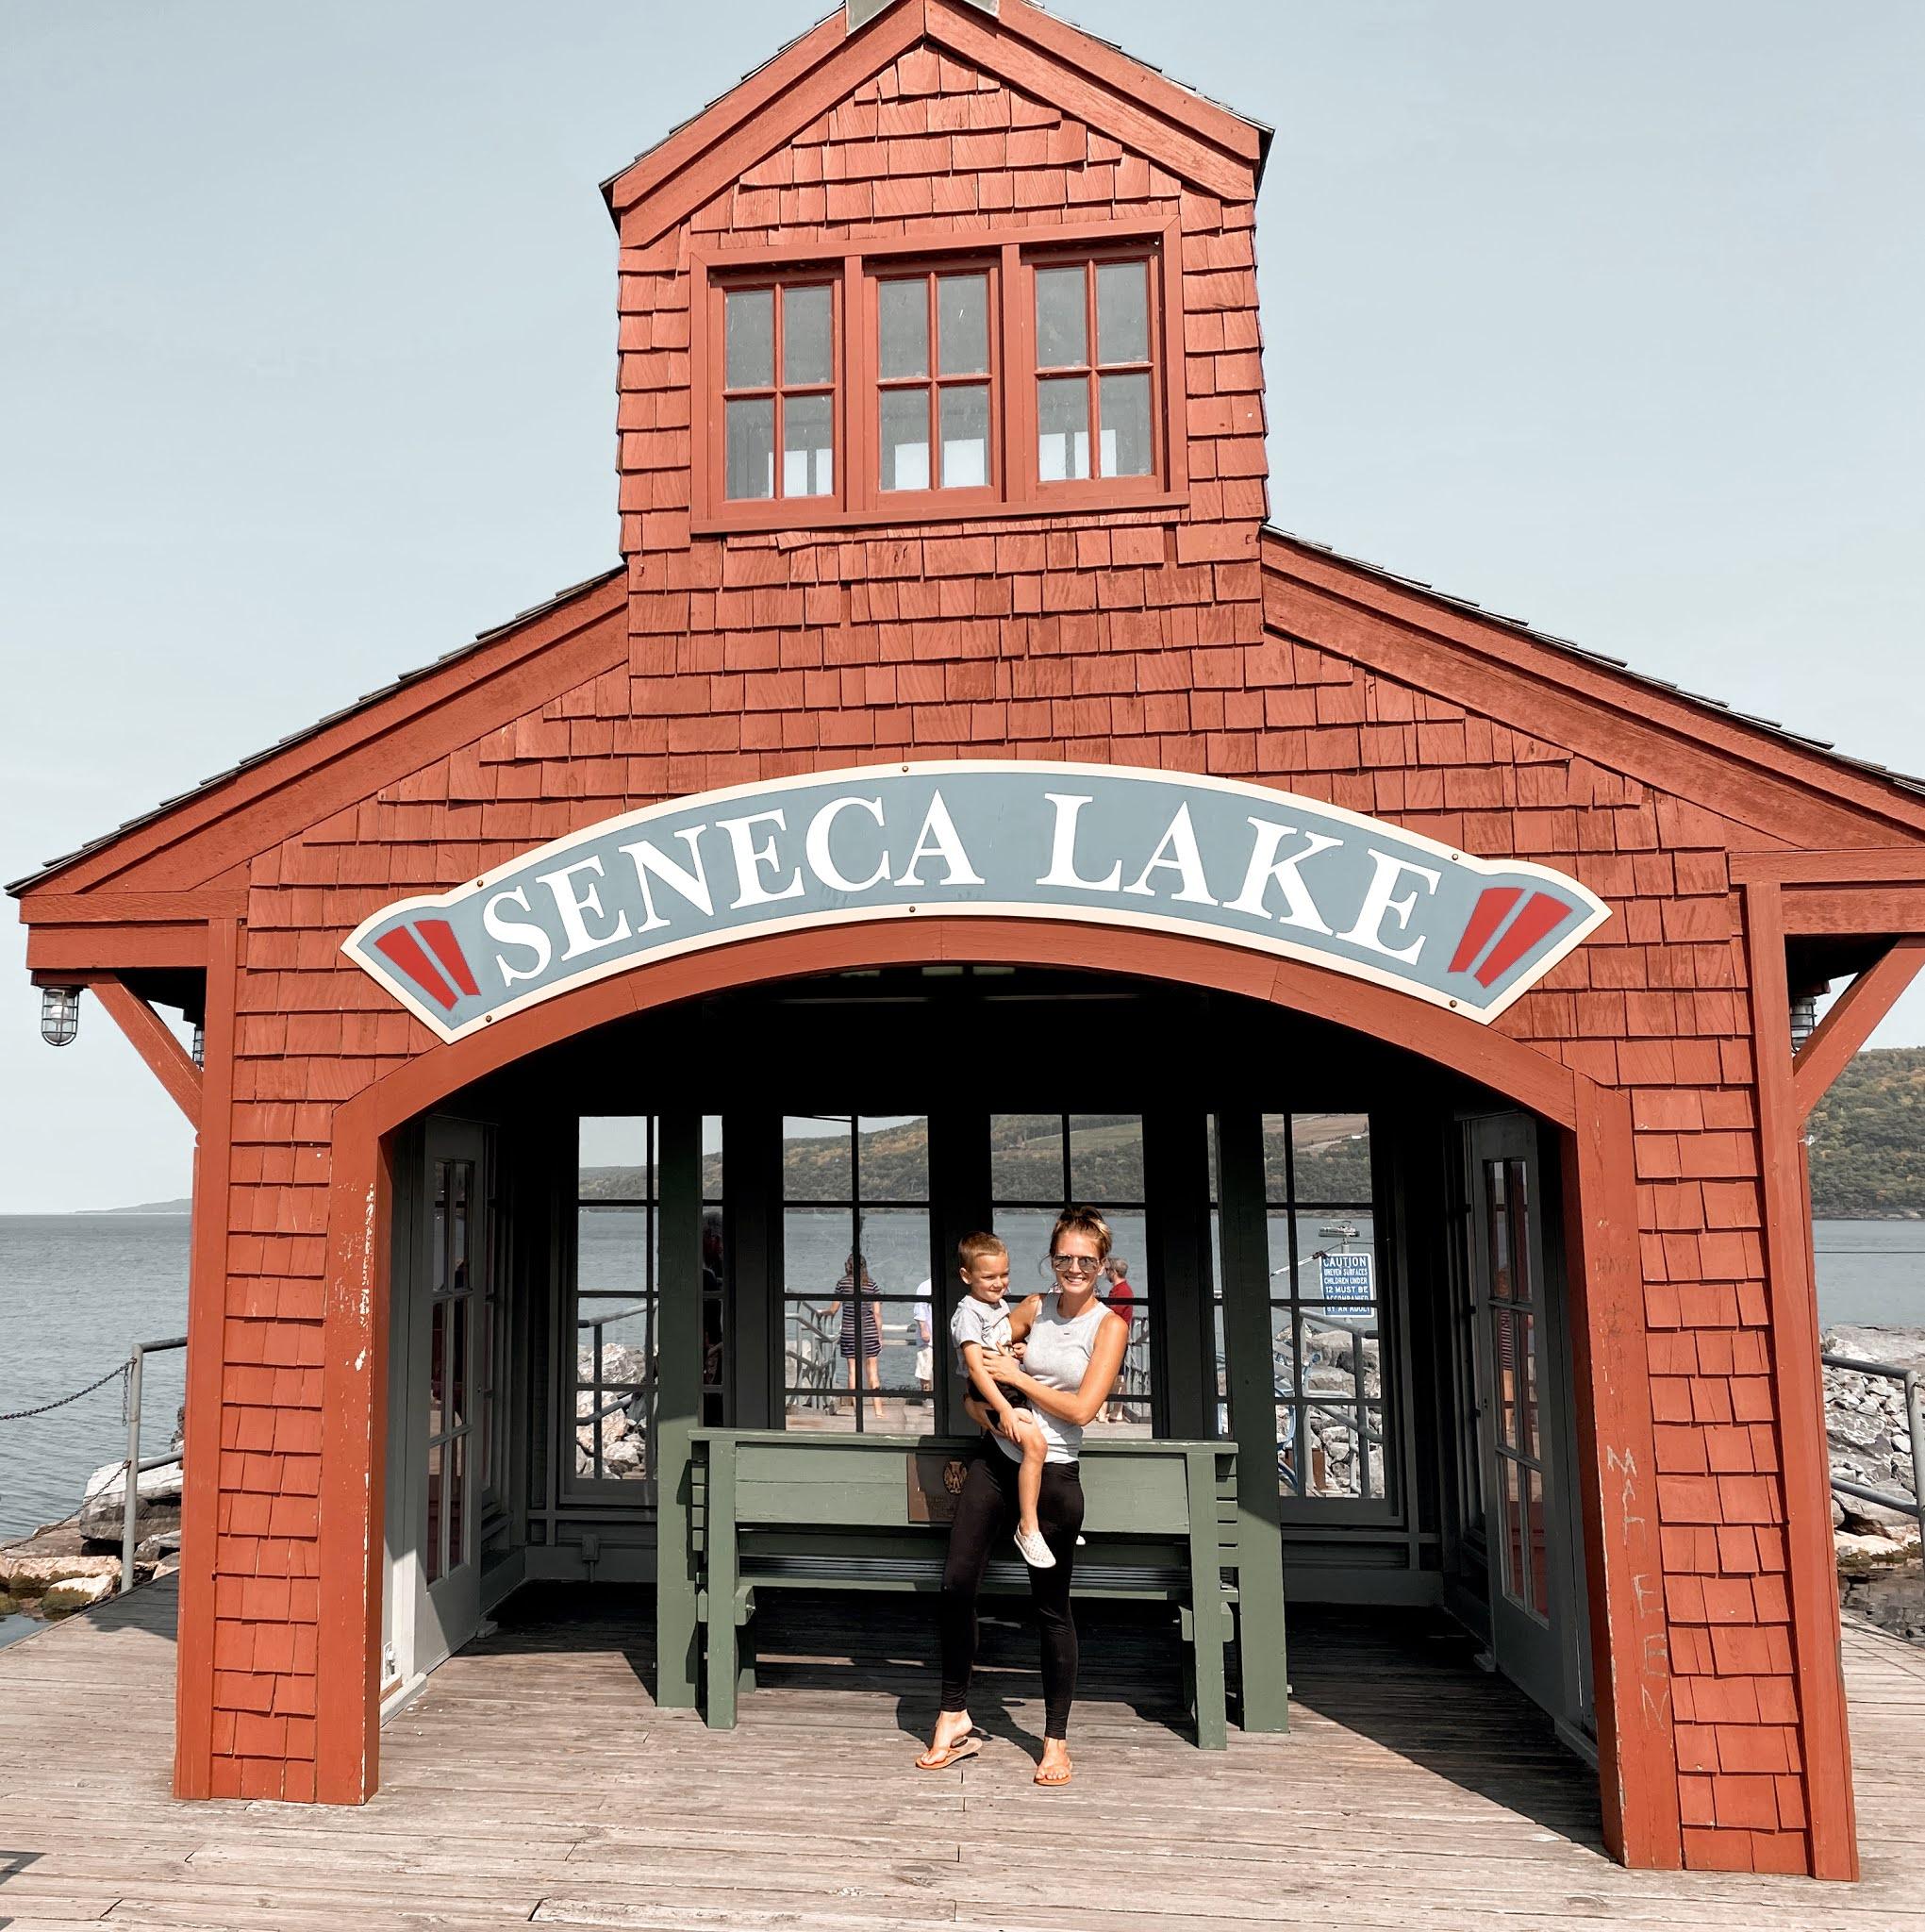 Seneca Lake, Finger Lakes in New York | biblio-style.com